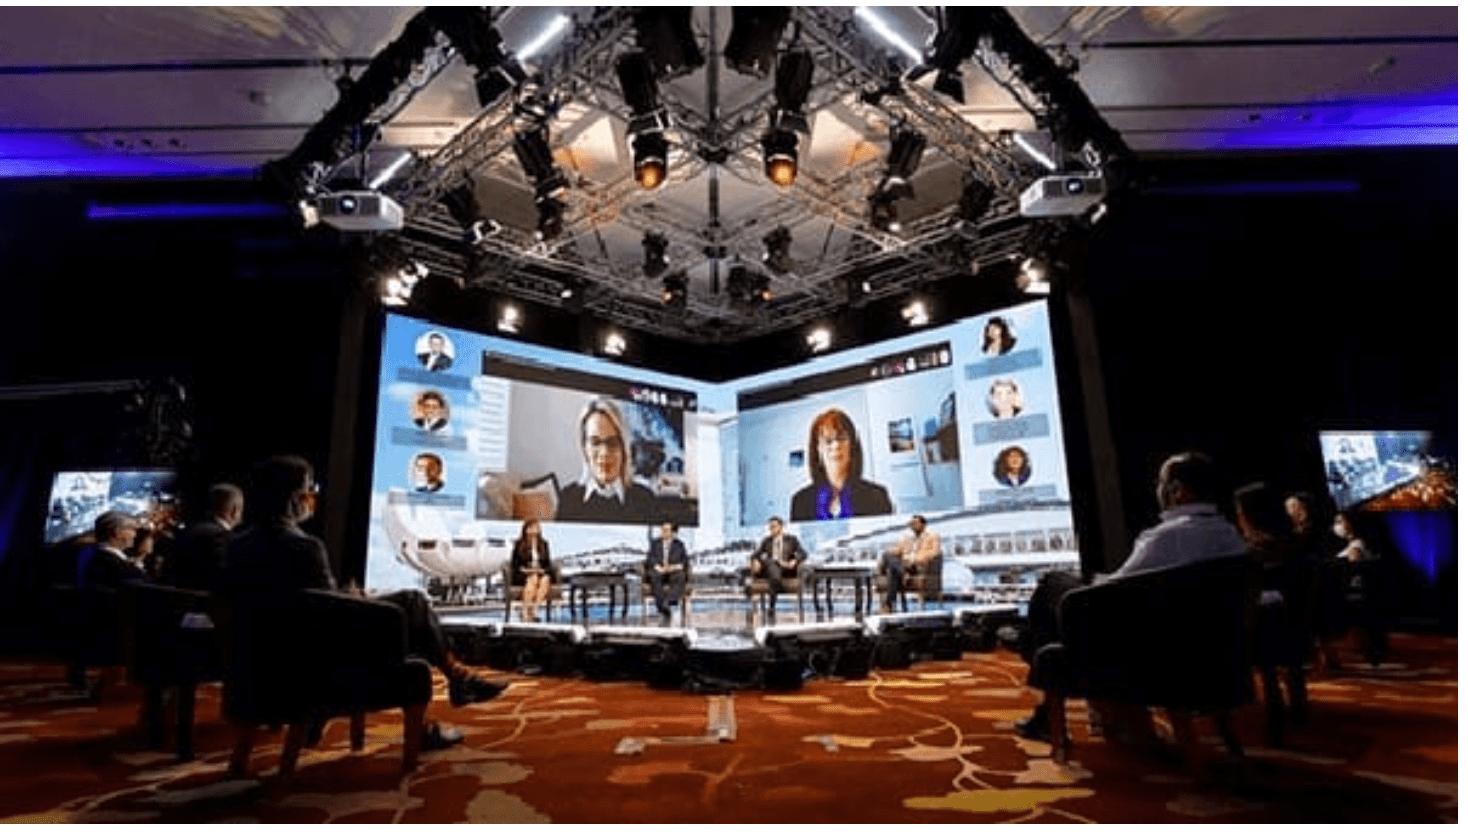 event broadcast studio - event trends